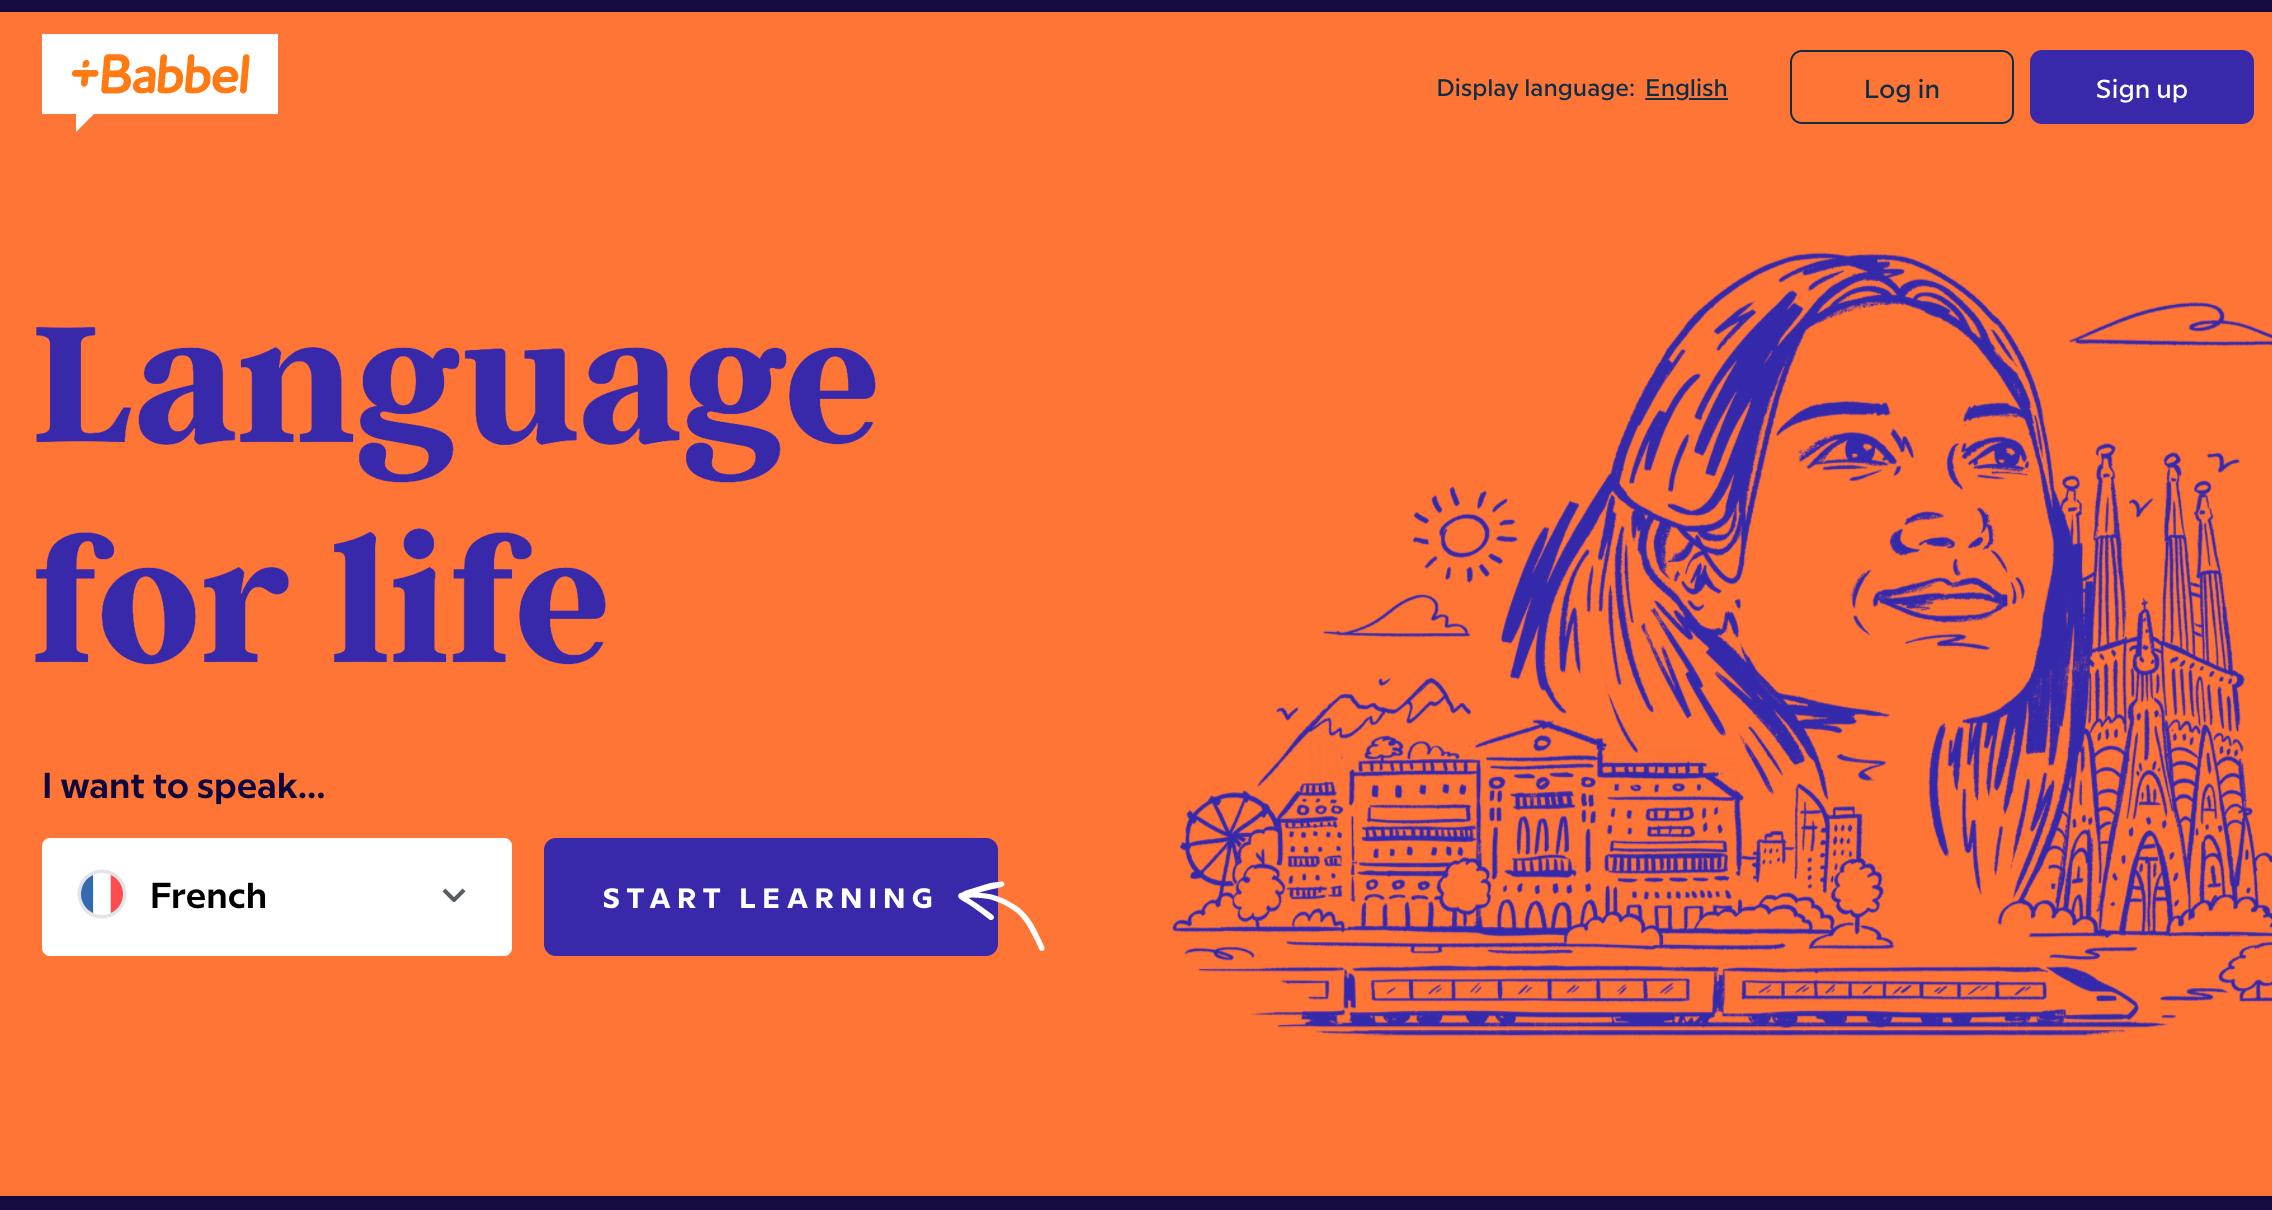 homescreen of Babbel language program